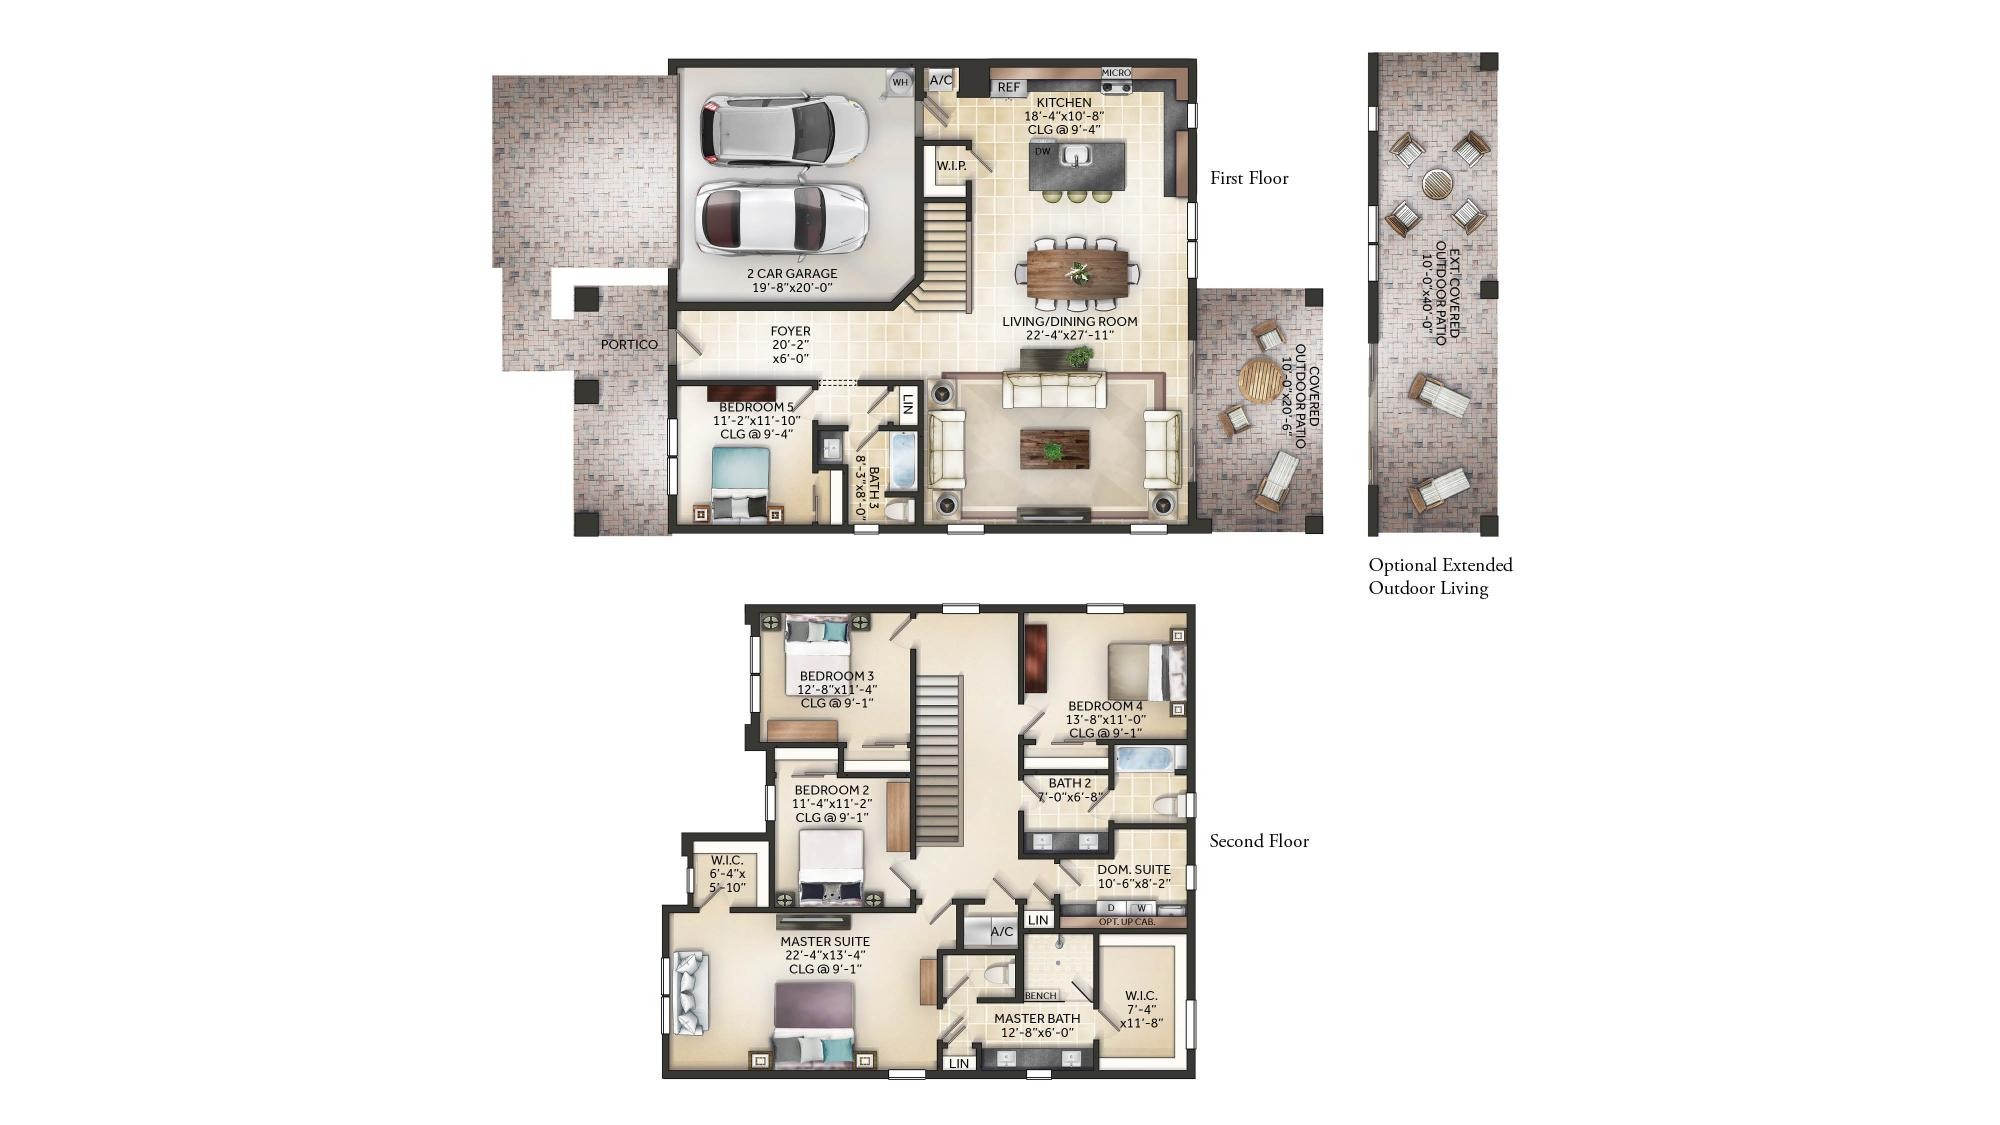 819917663931846_woodmere_floorplan.jpg